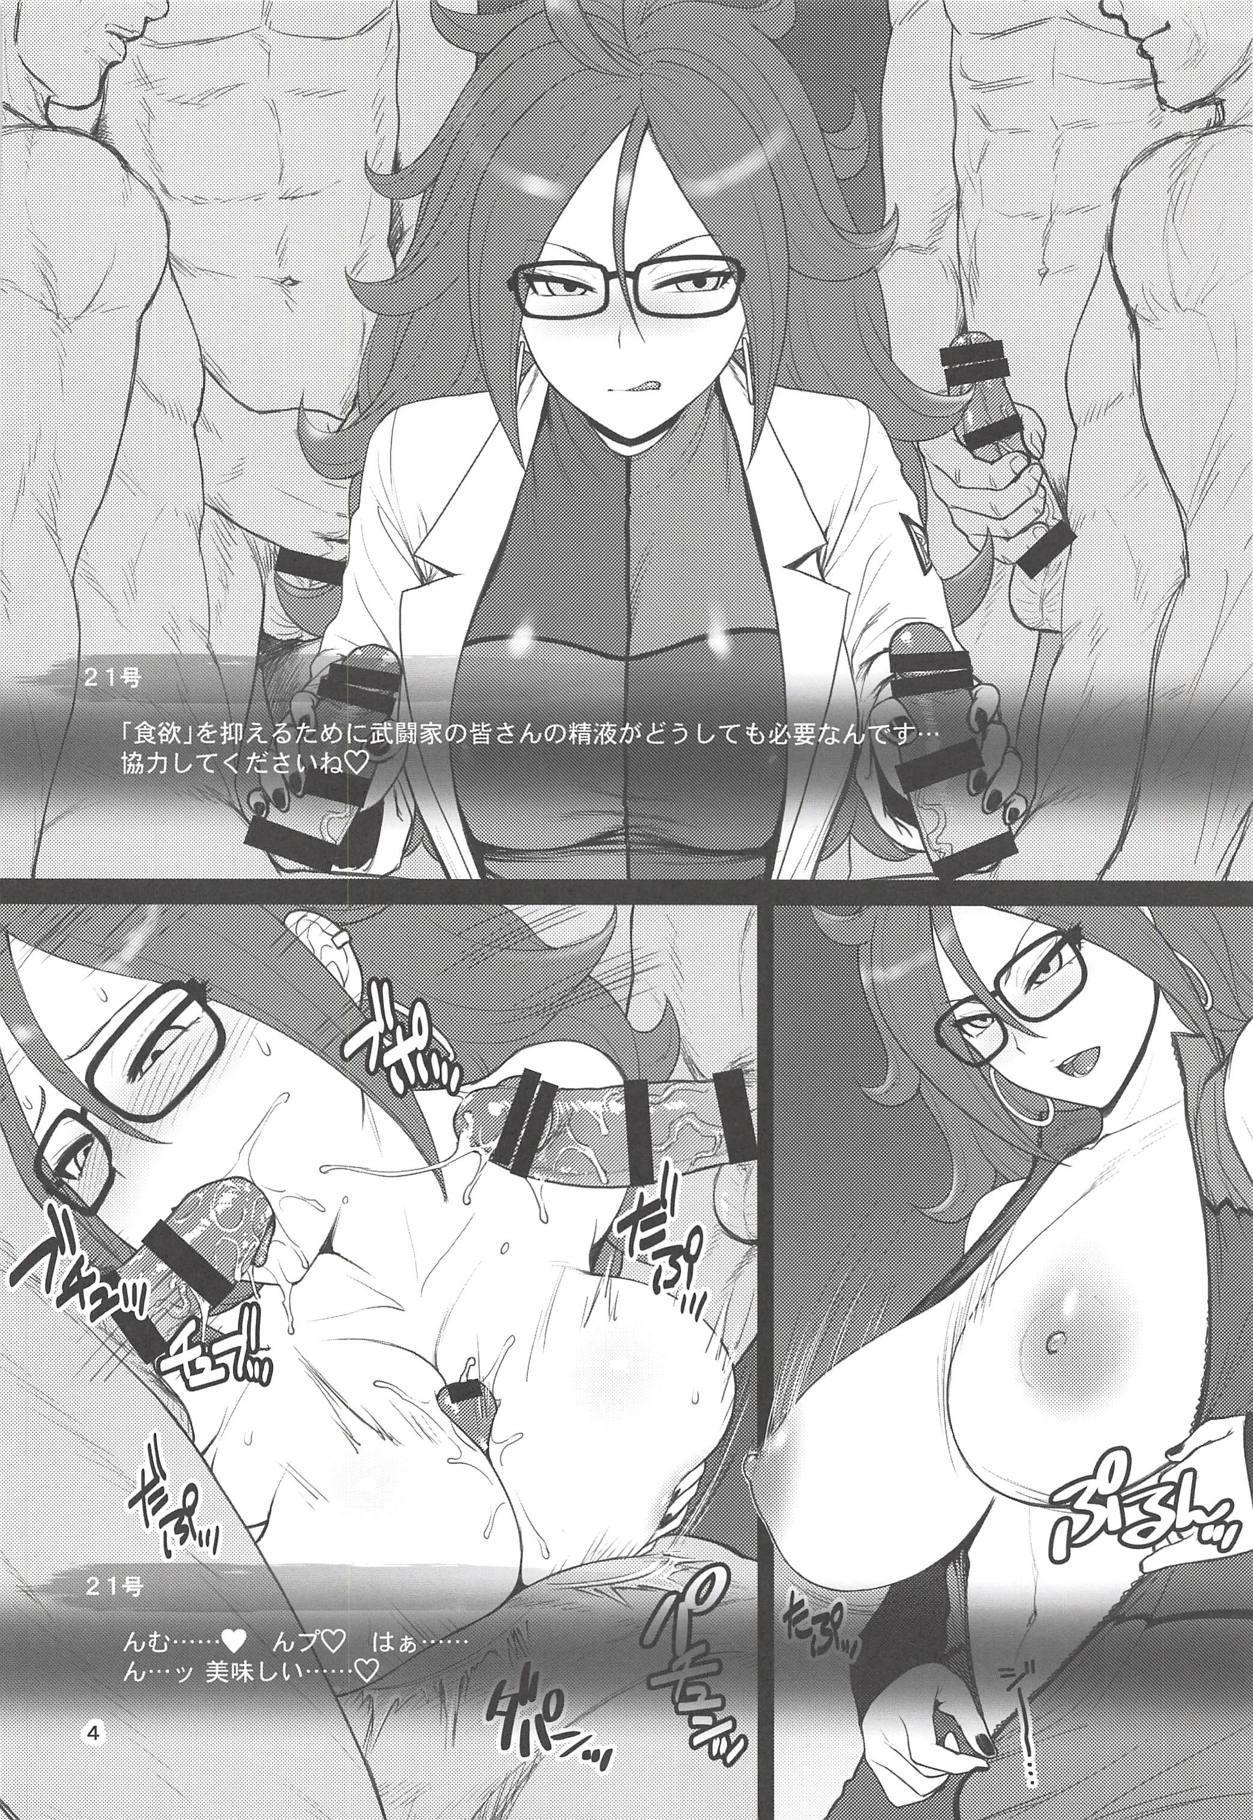 (C94) [Shinnihon Pepsitou (St.germain-sal)] 1-tsubu de 2-do Oishii (Dragon Ball FighterZ) 2